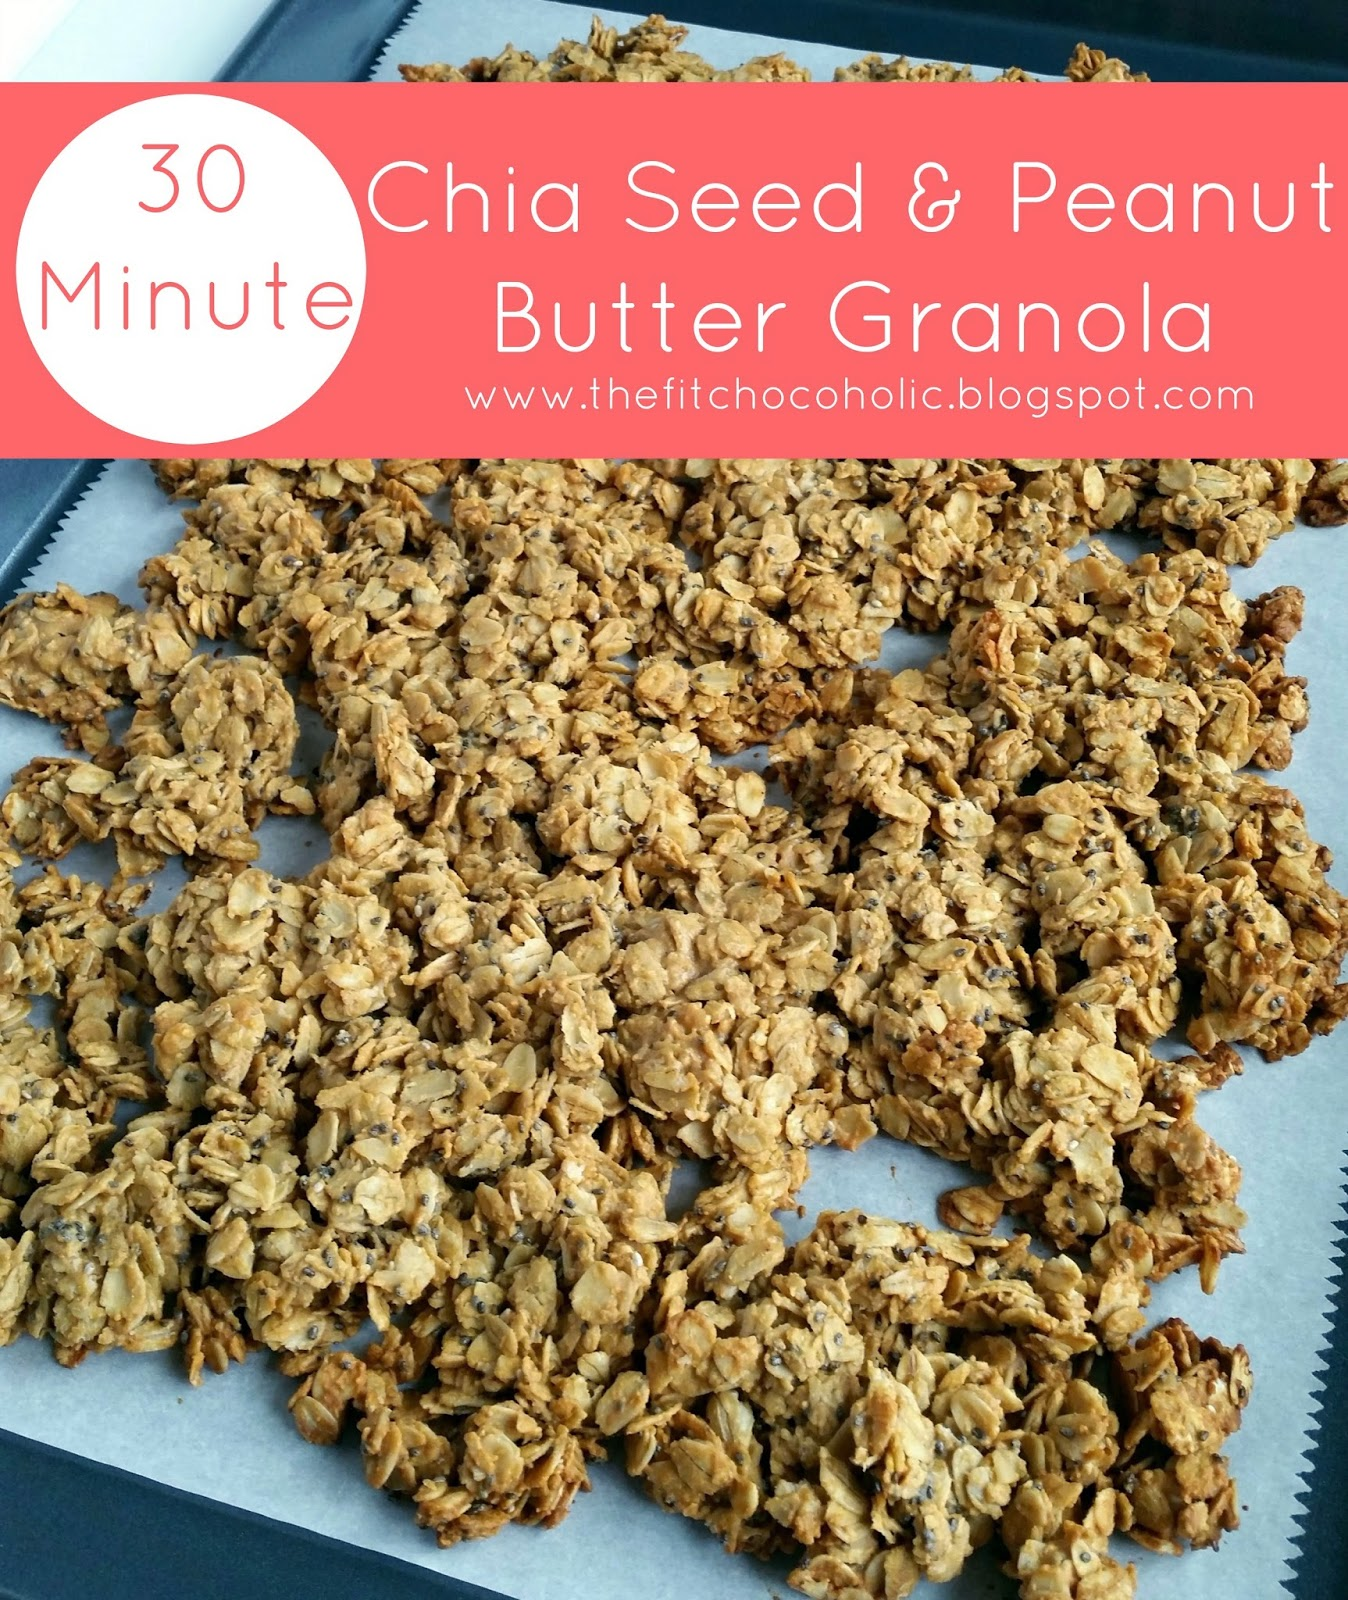 30 Minute Chia Seed & Peanut Butter Granola